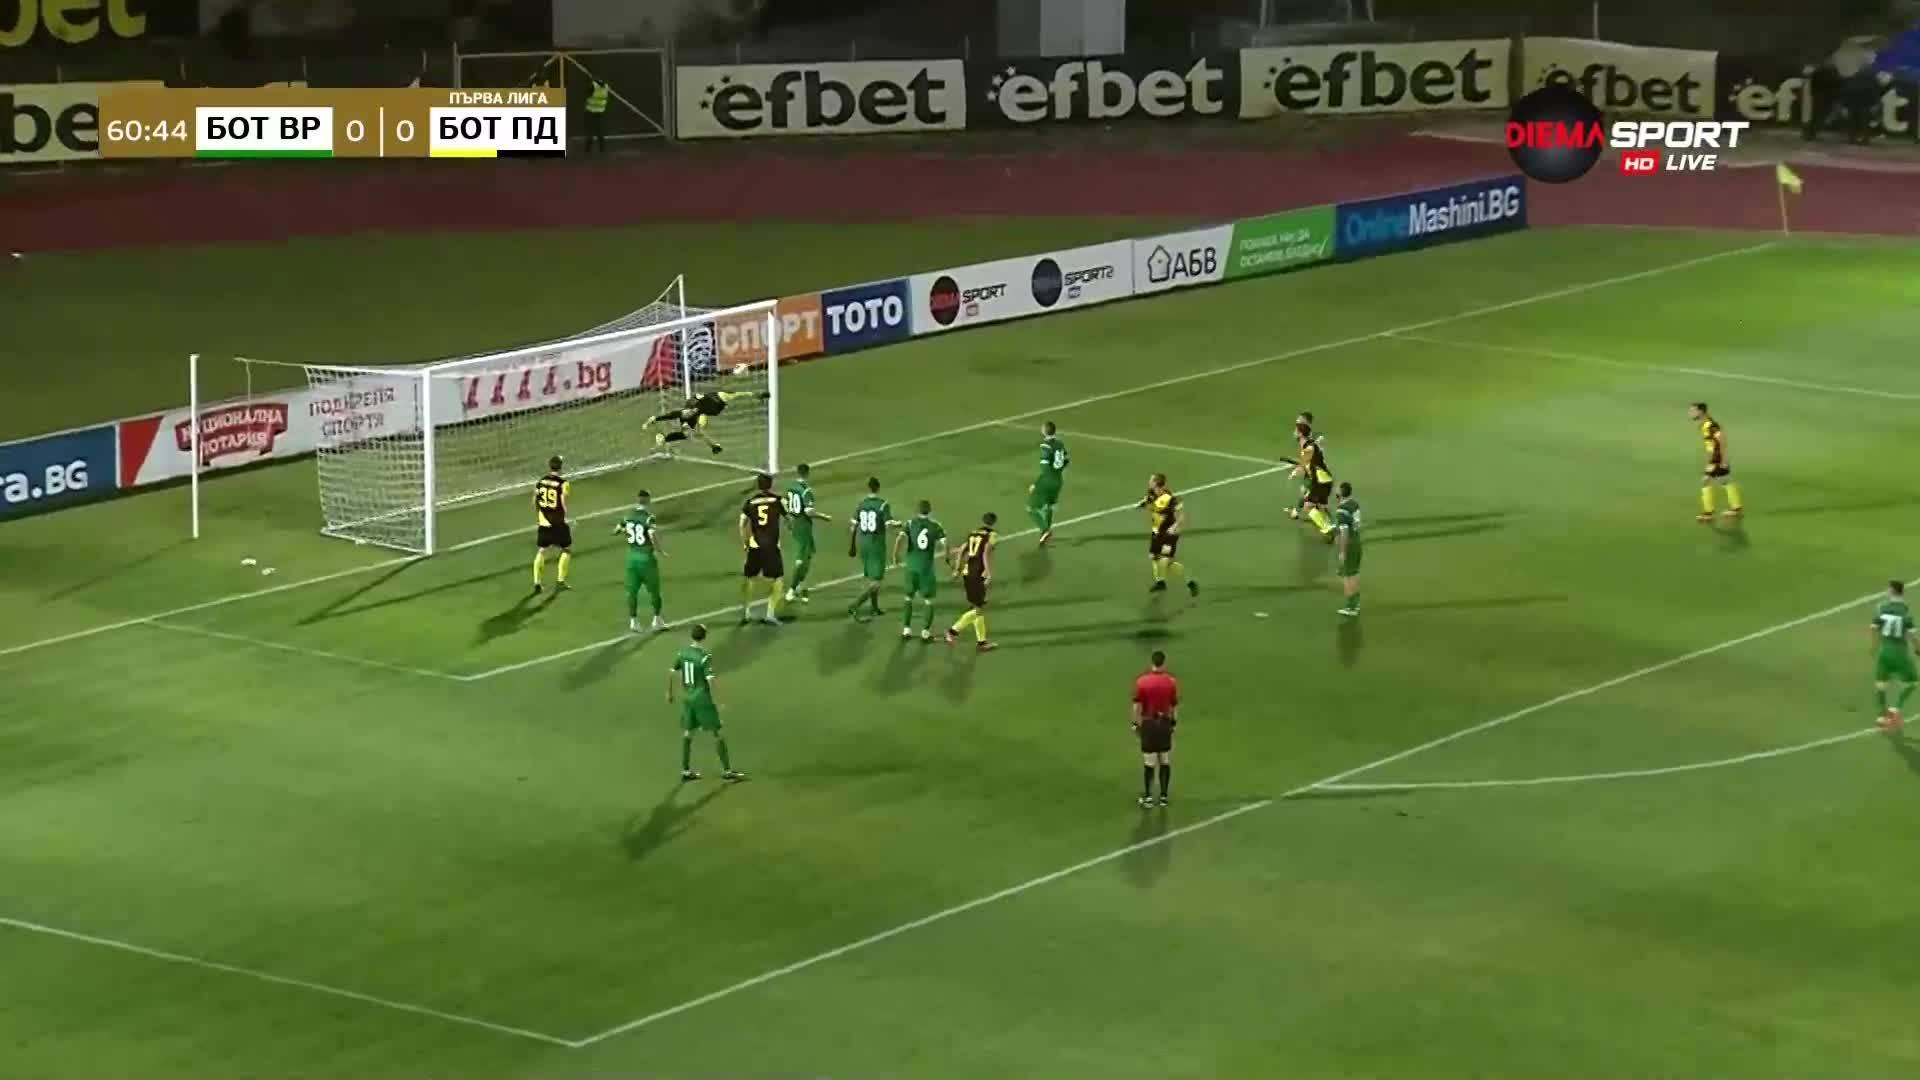 Резерва изведе Ботев Пловдив срещу Враца